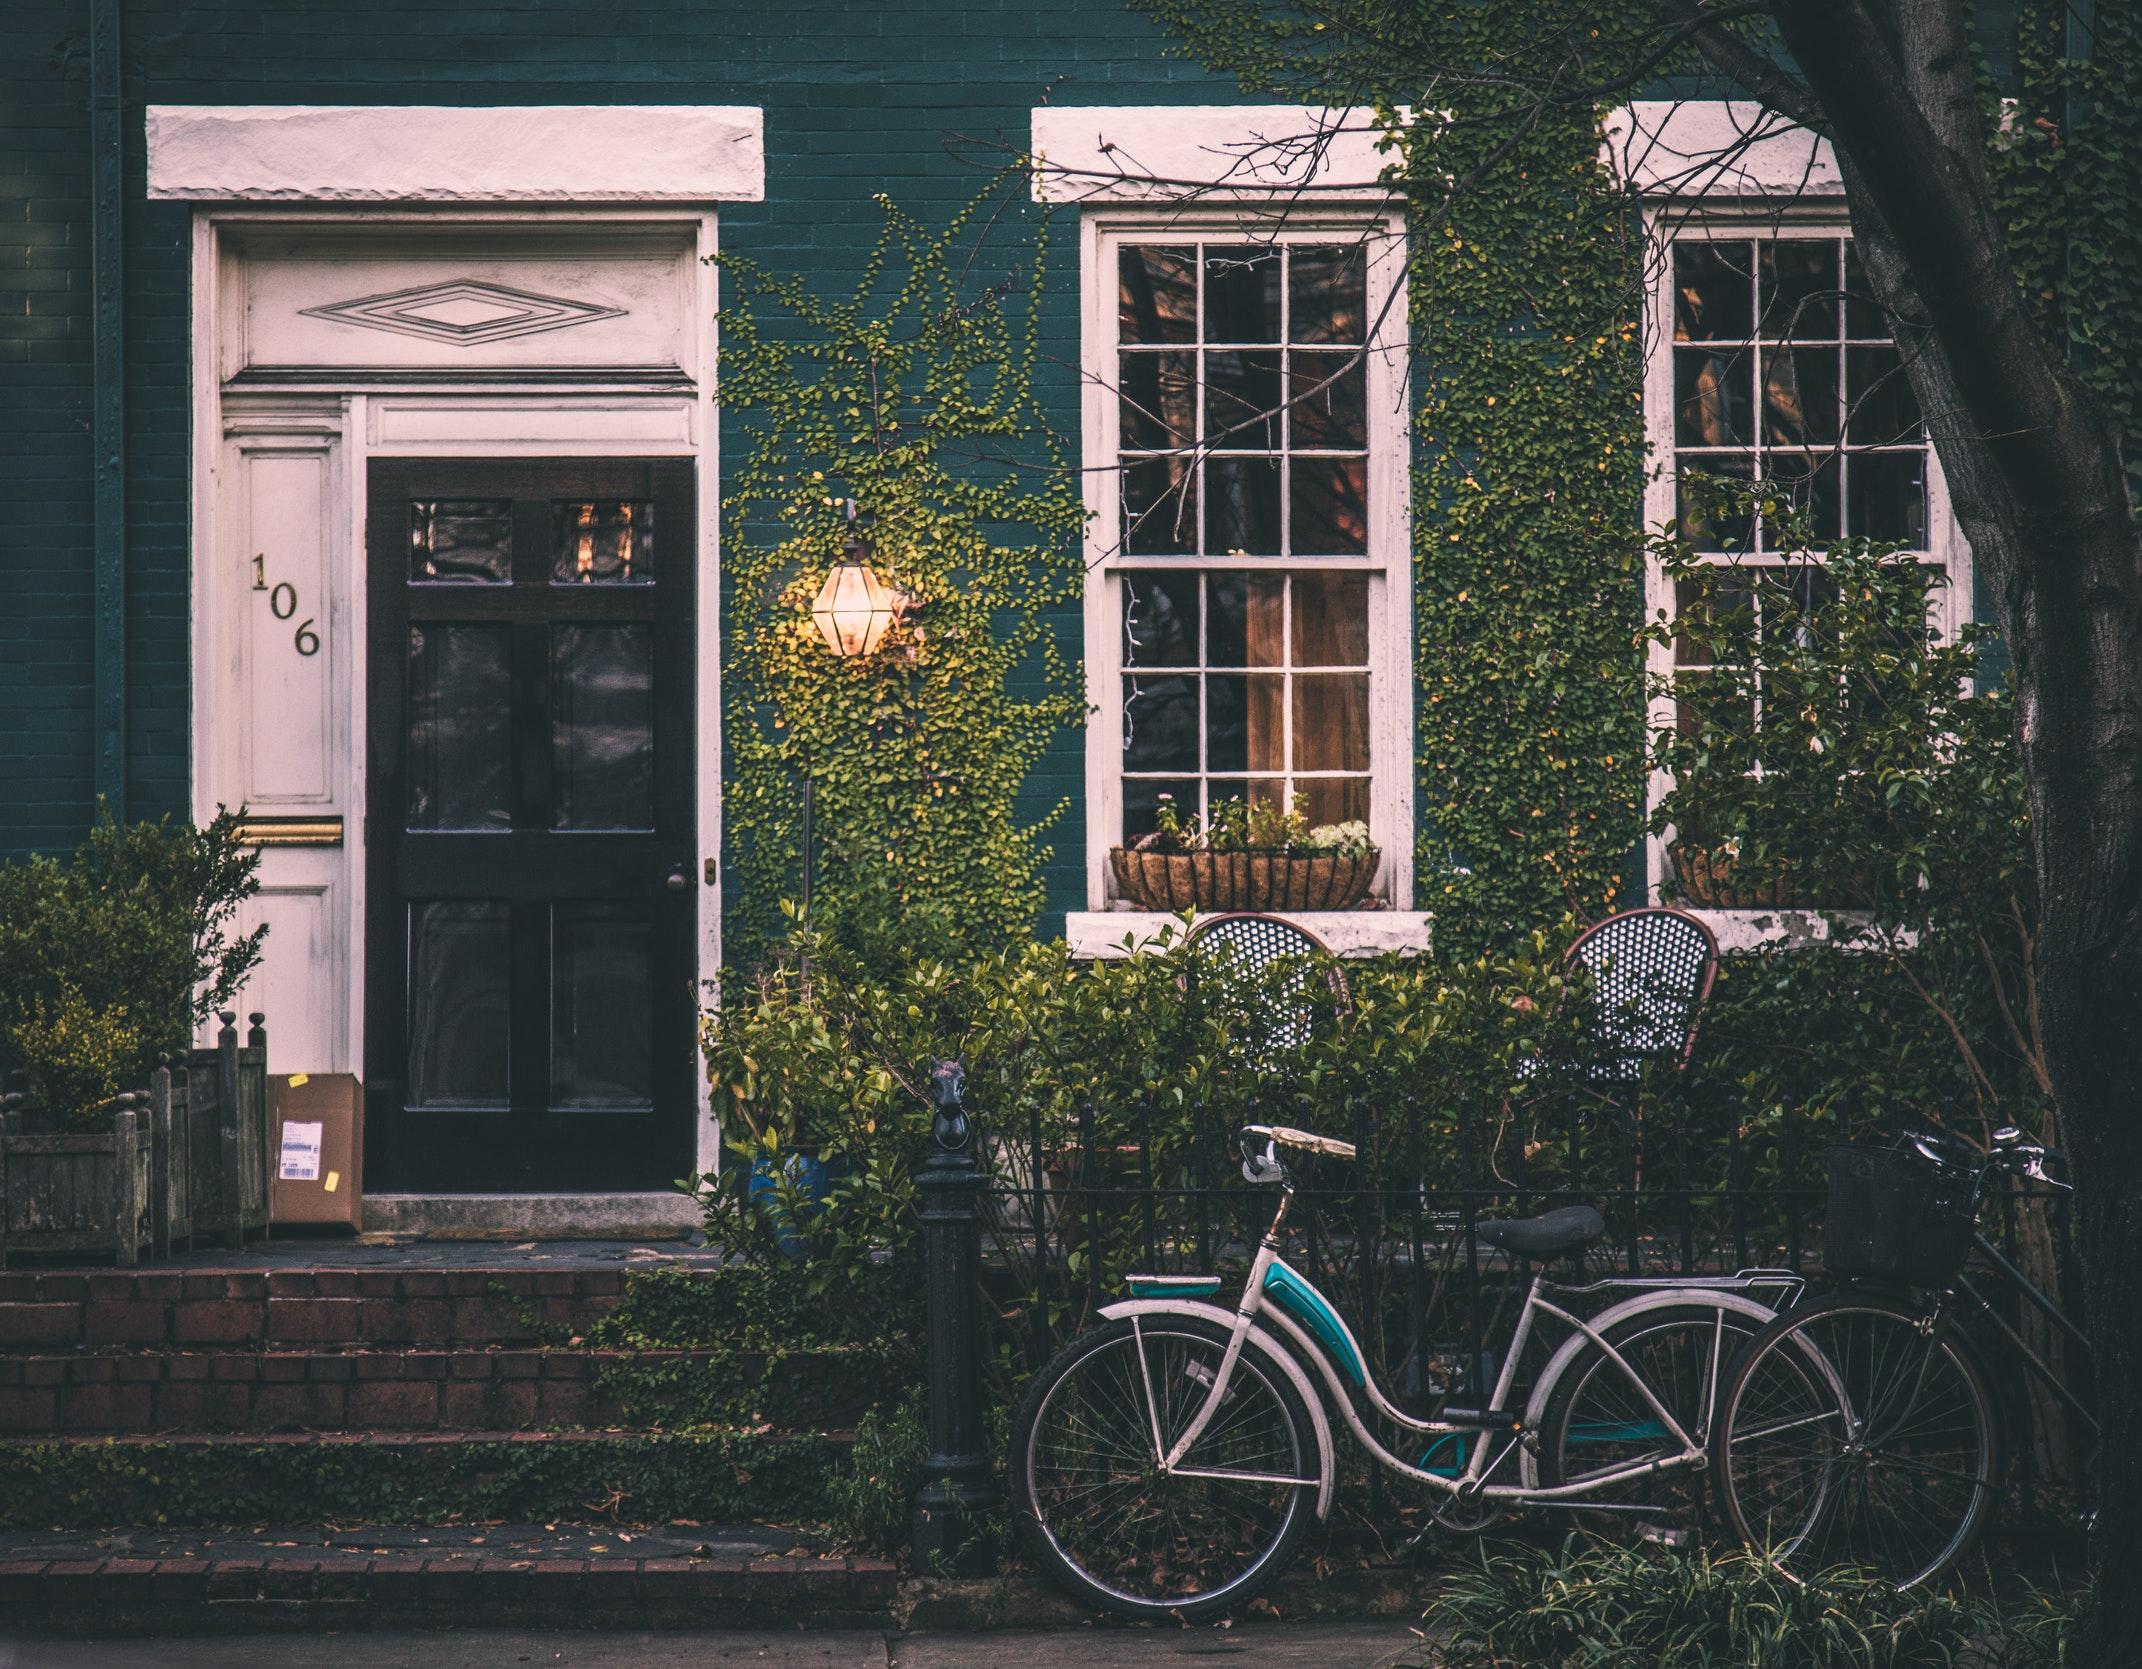 property management responsibilities